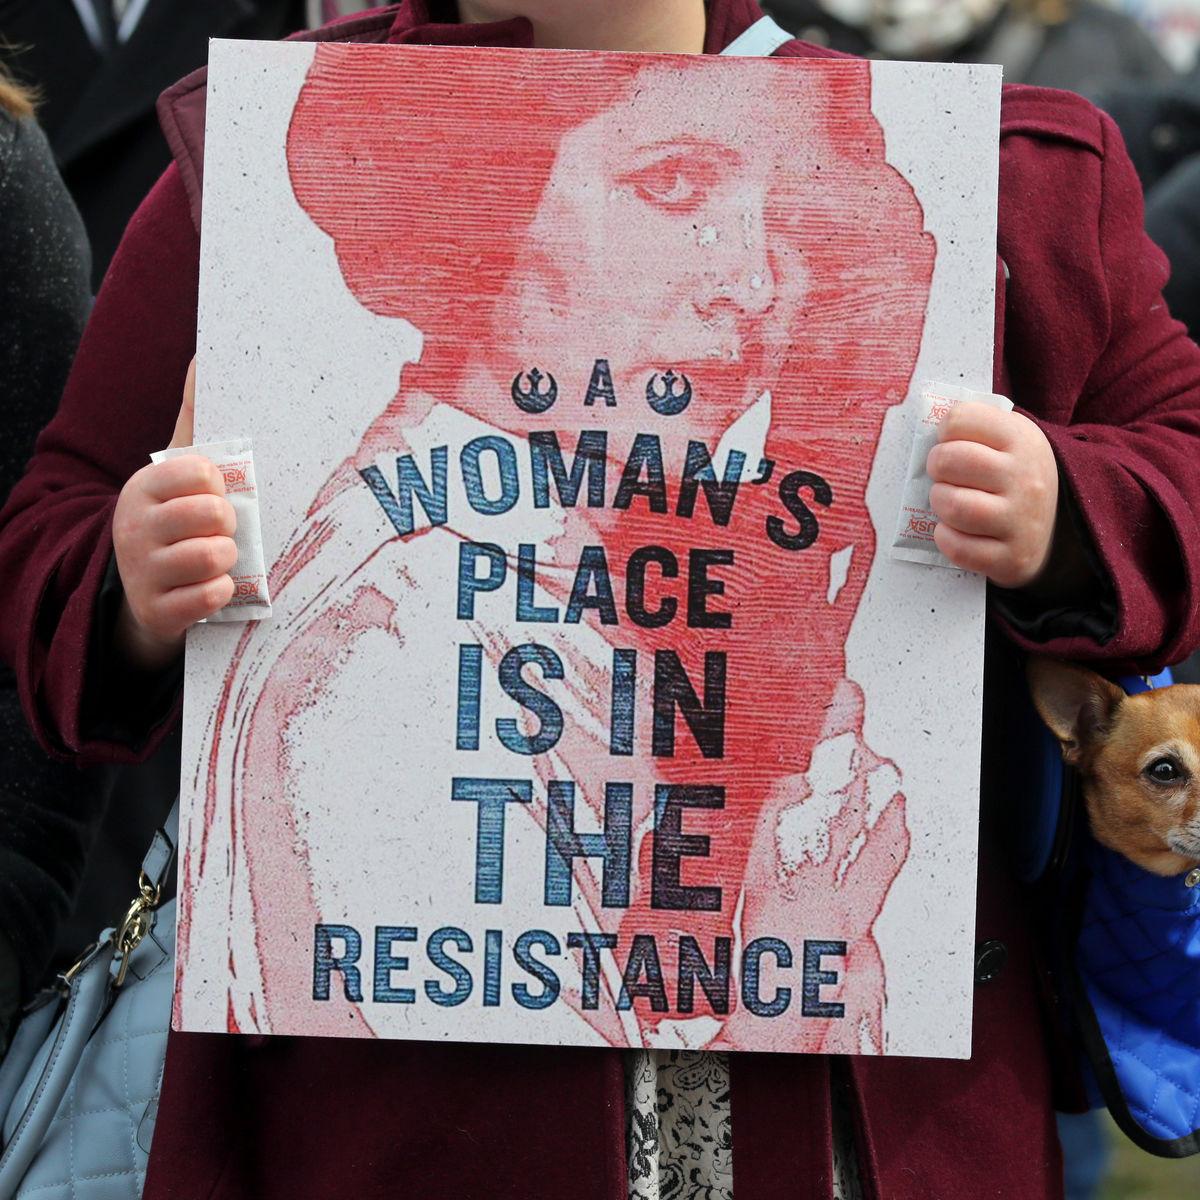 leia_resistance_sign.jpg